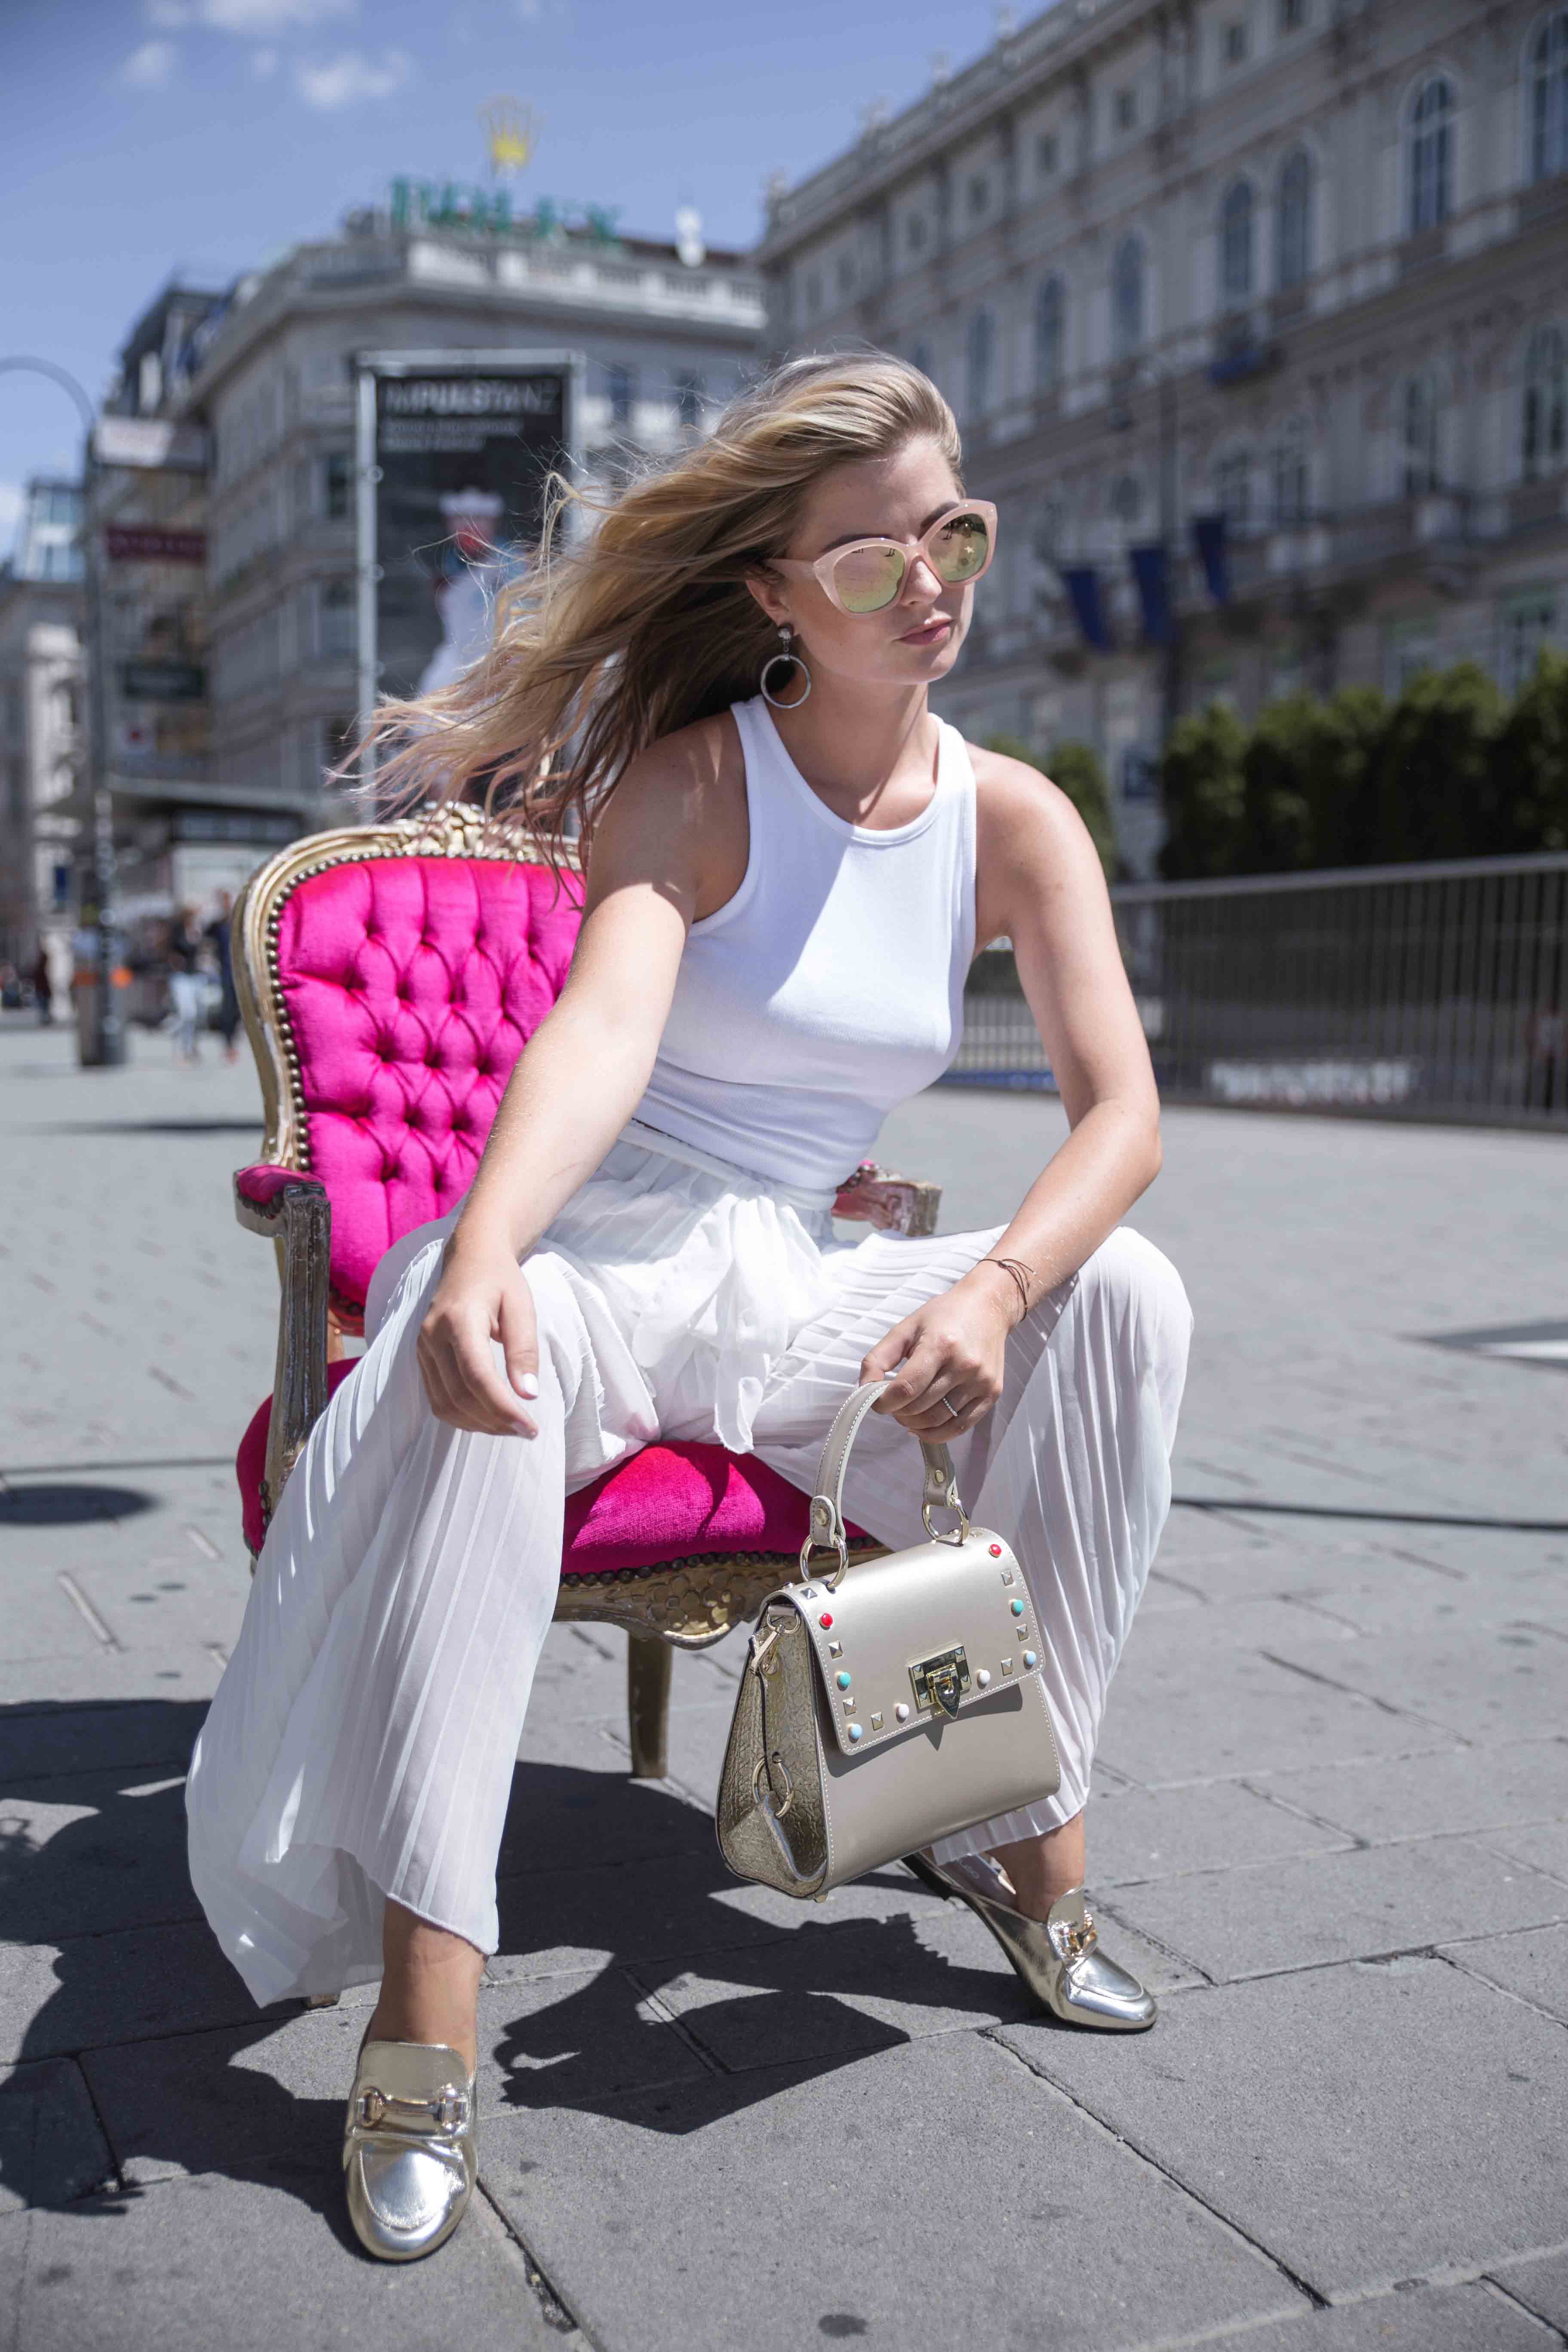 Model sitting on chair in Vienna